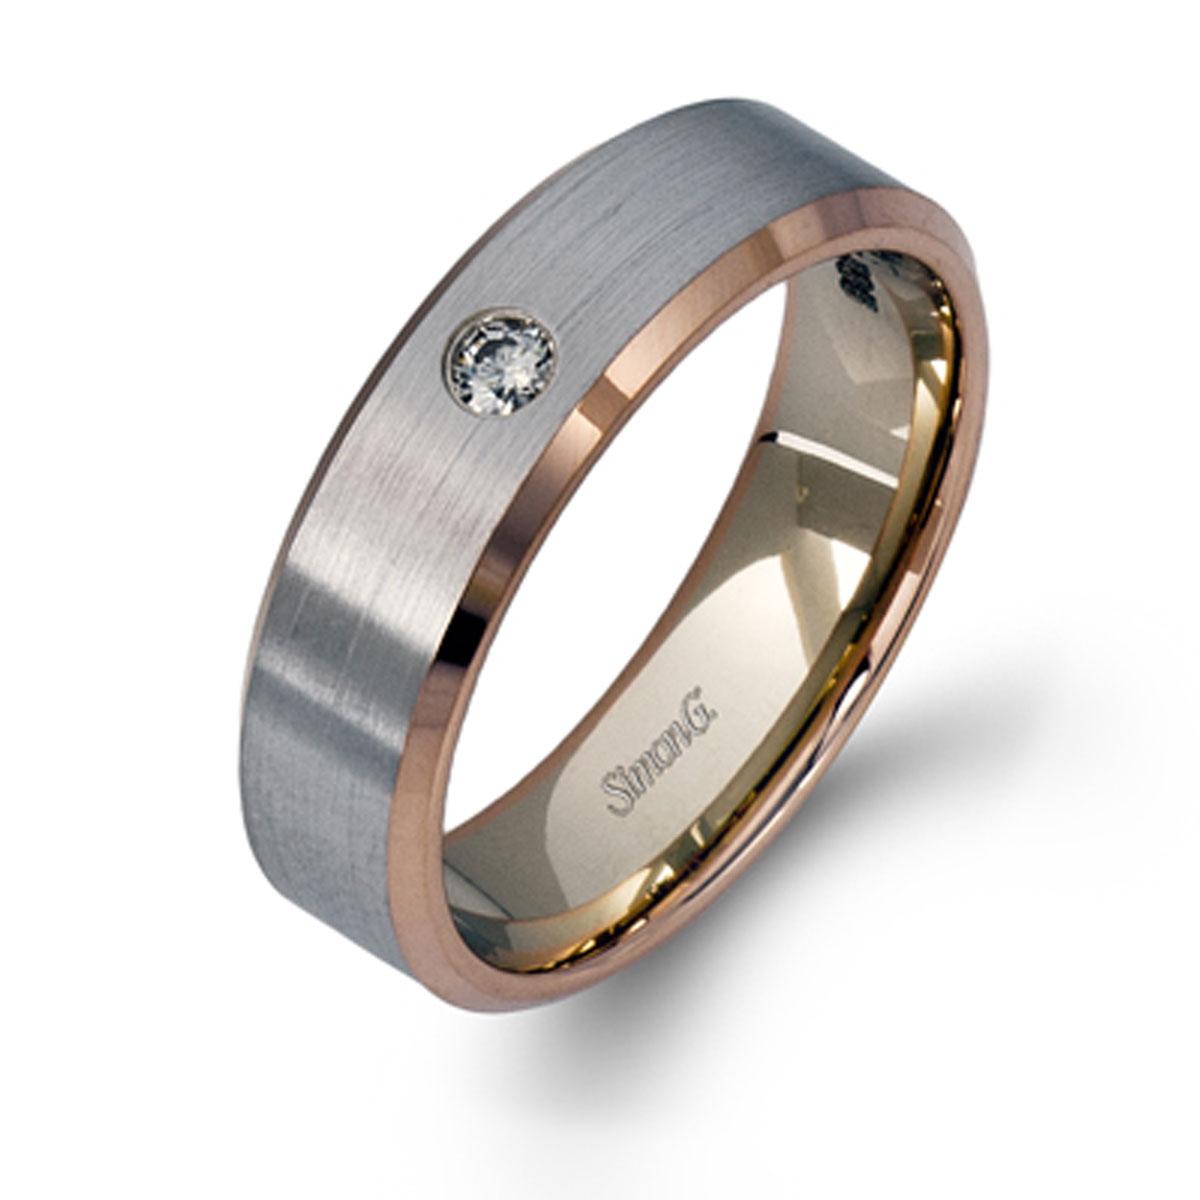 simon g engagement rings .05ctw diamonds modern band